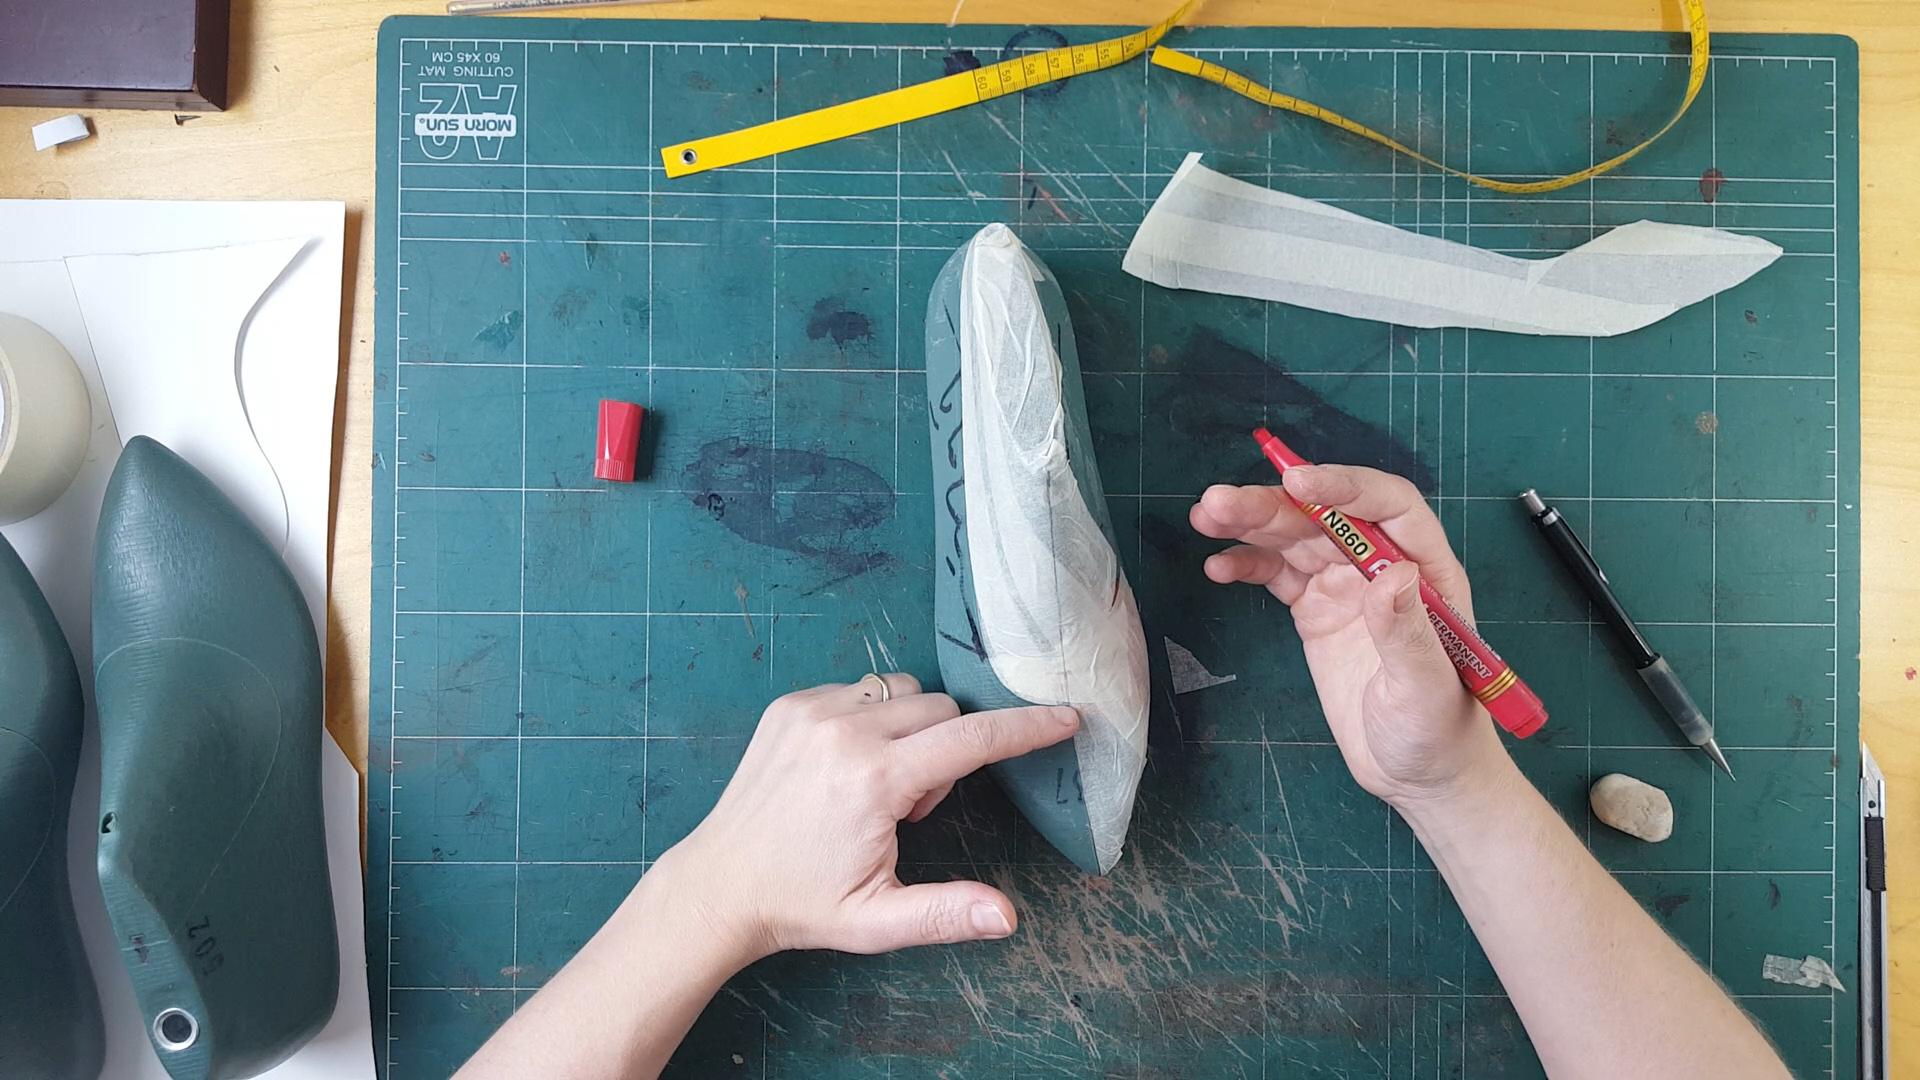 Throat line in ACMasking tape shoe pattern